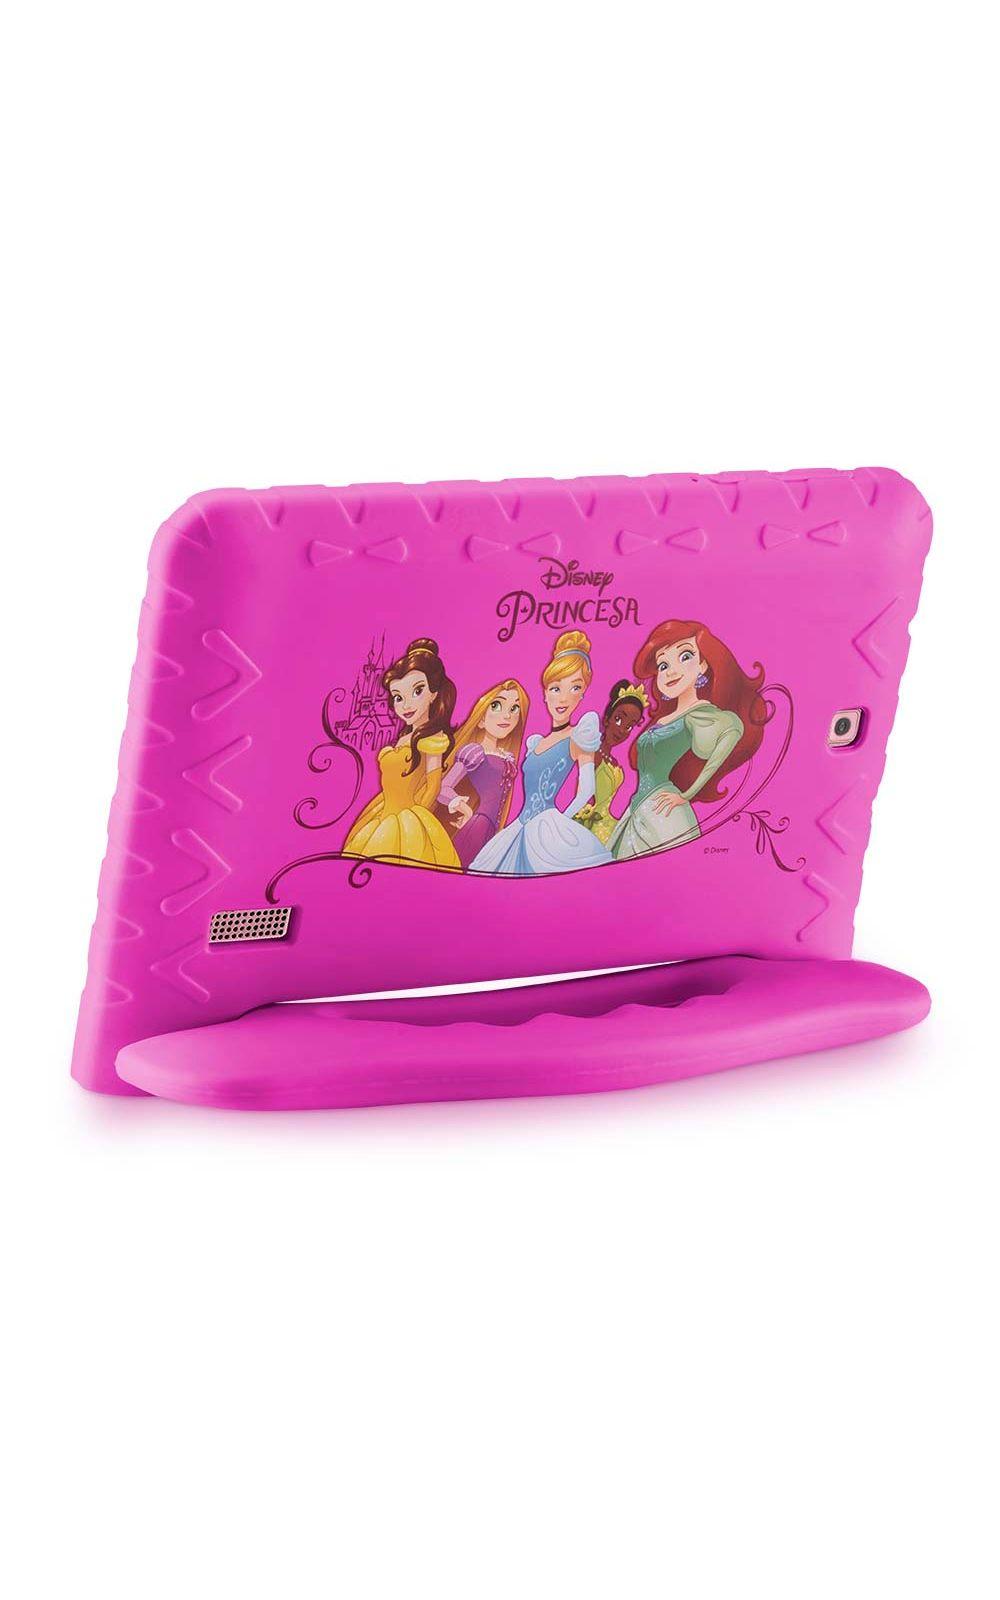 Foto 3 - Tablet Multilaser Disney Princesas Plus 16GB Tela 7 Pol. Quad Core Dual Câmera Rosa- NB308